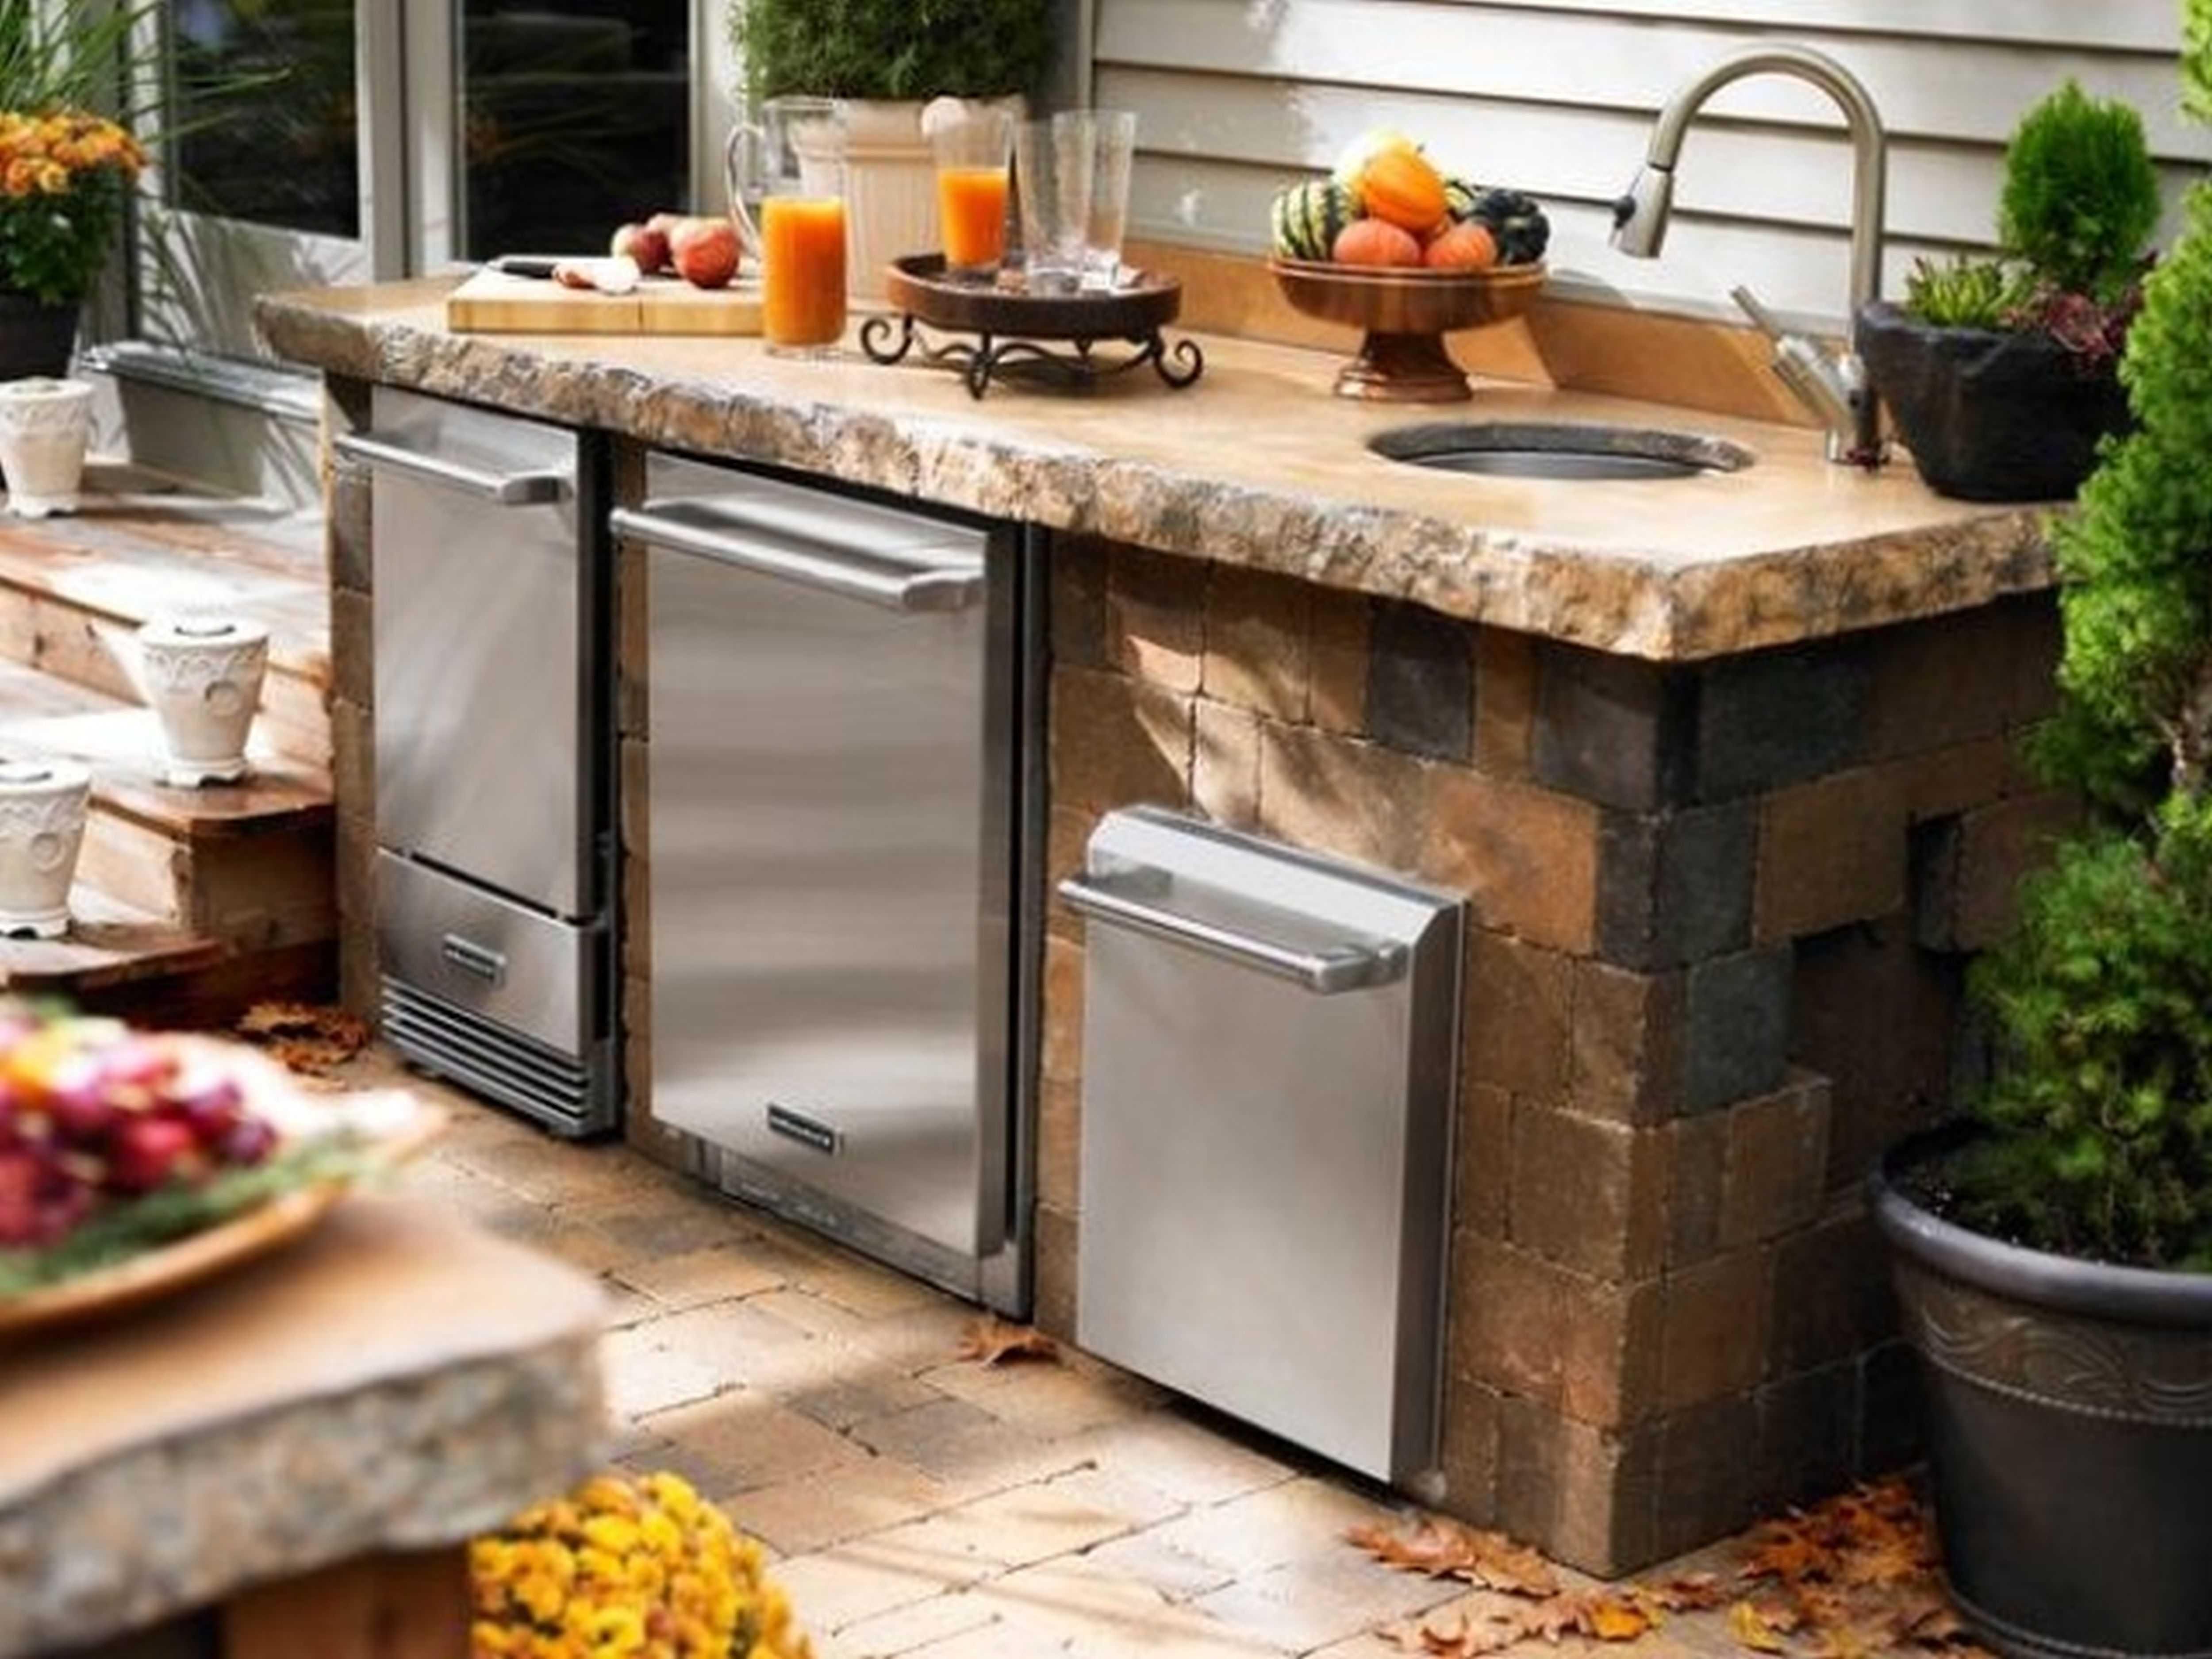 Best Outdoor Kitchen Sink Drain Idea — Randolph Indoor and ... on Outdoor Patio Sink id=25684